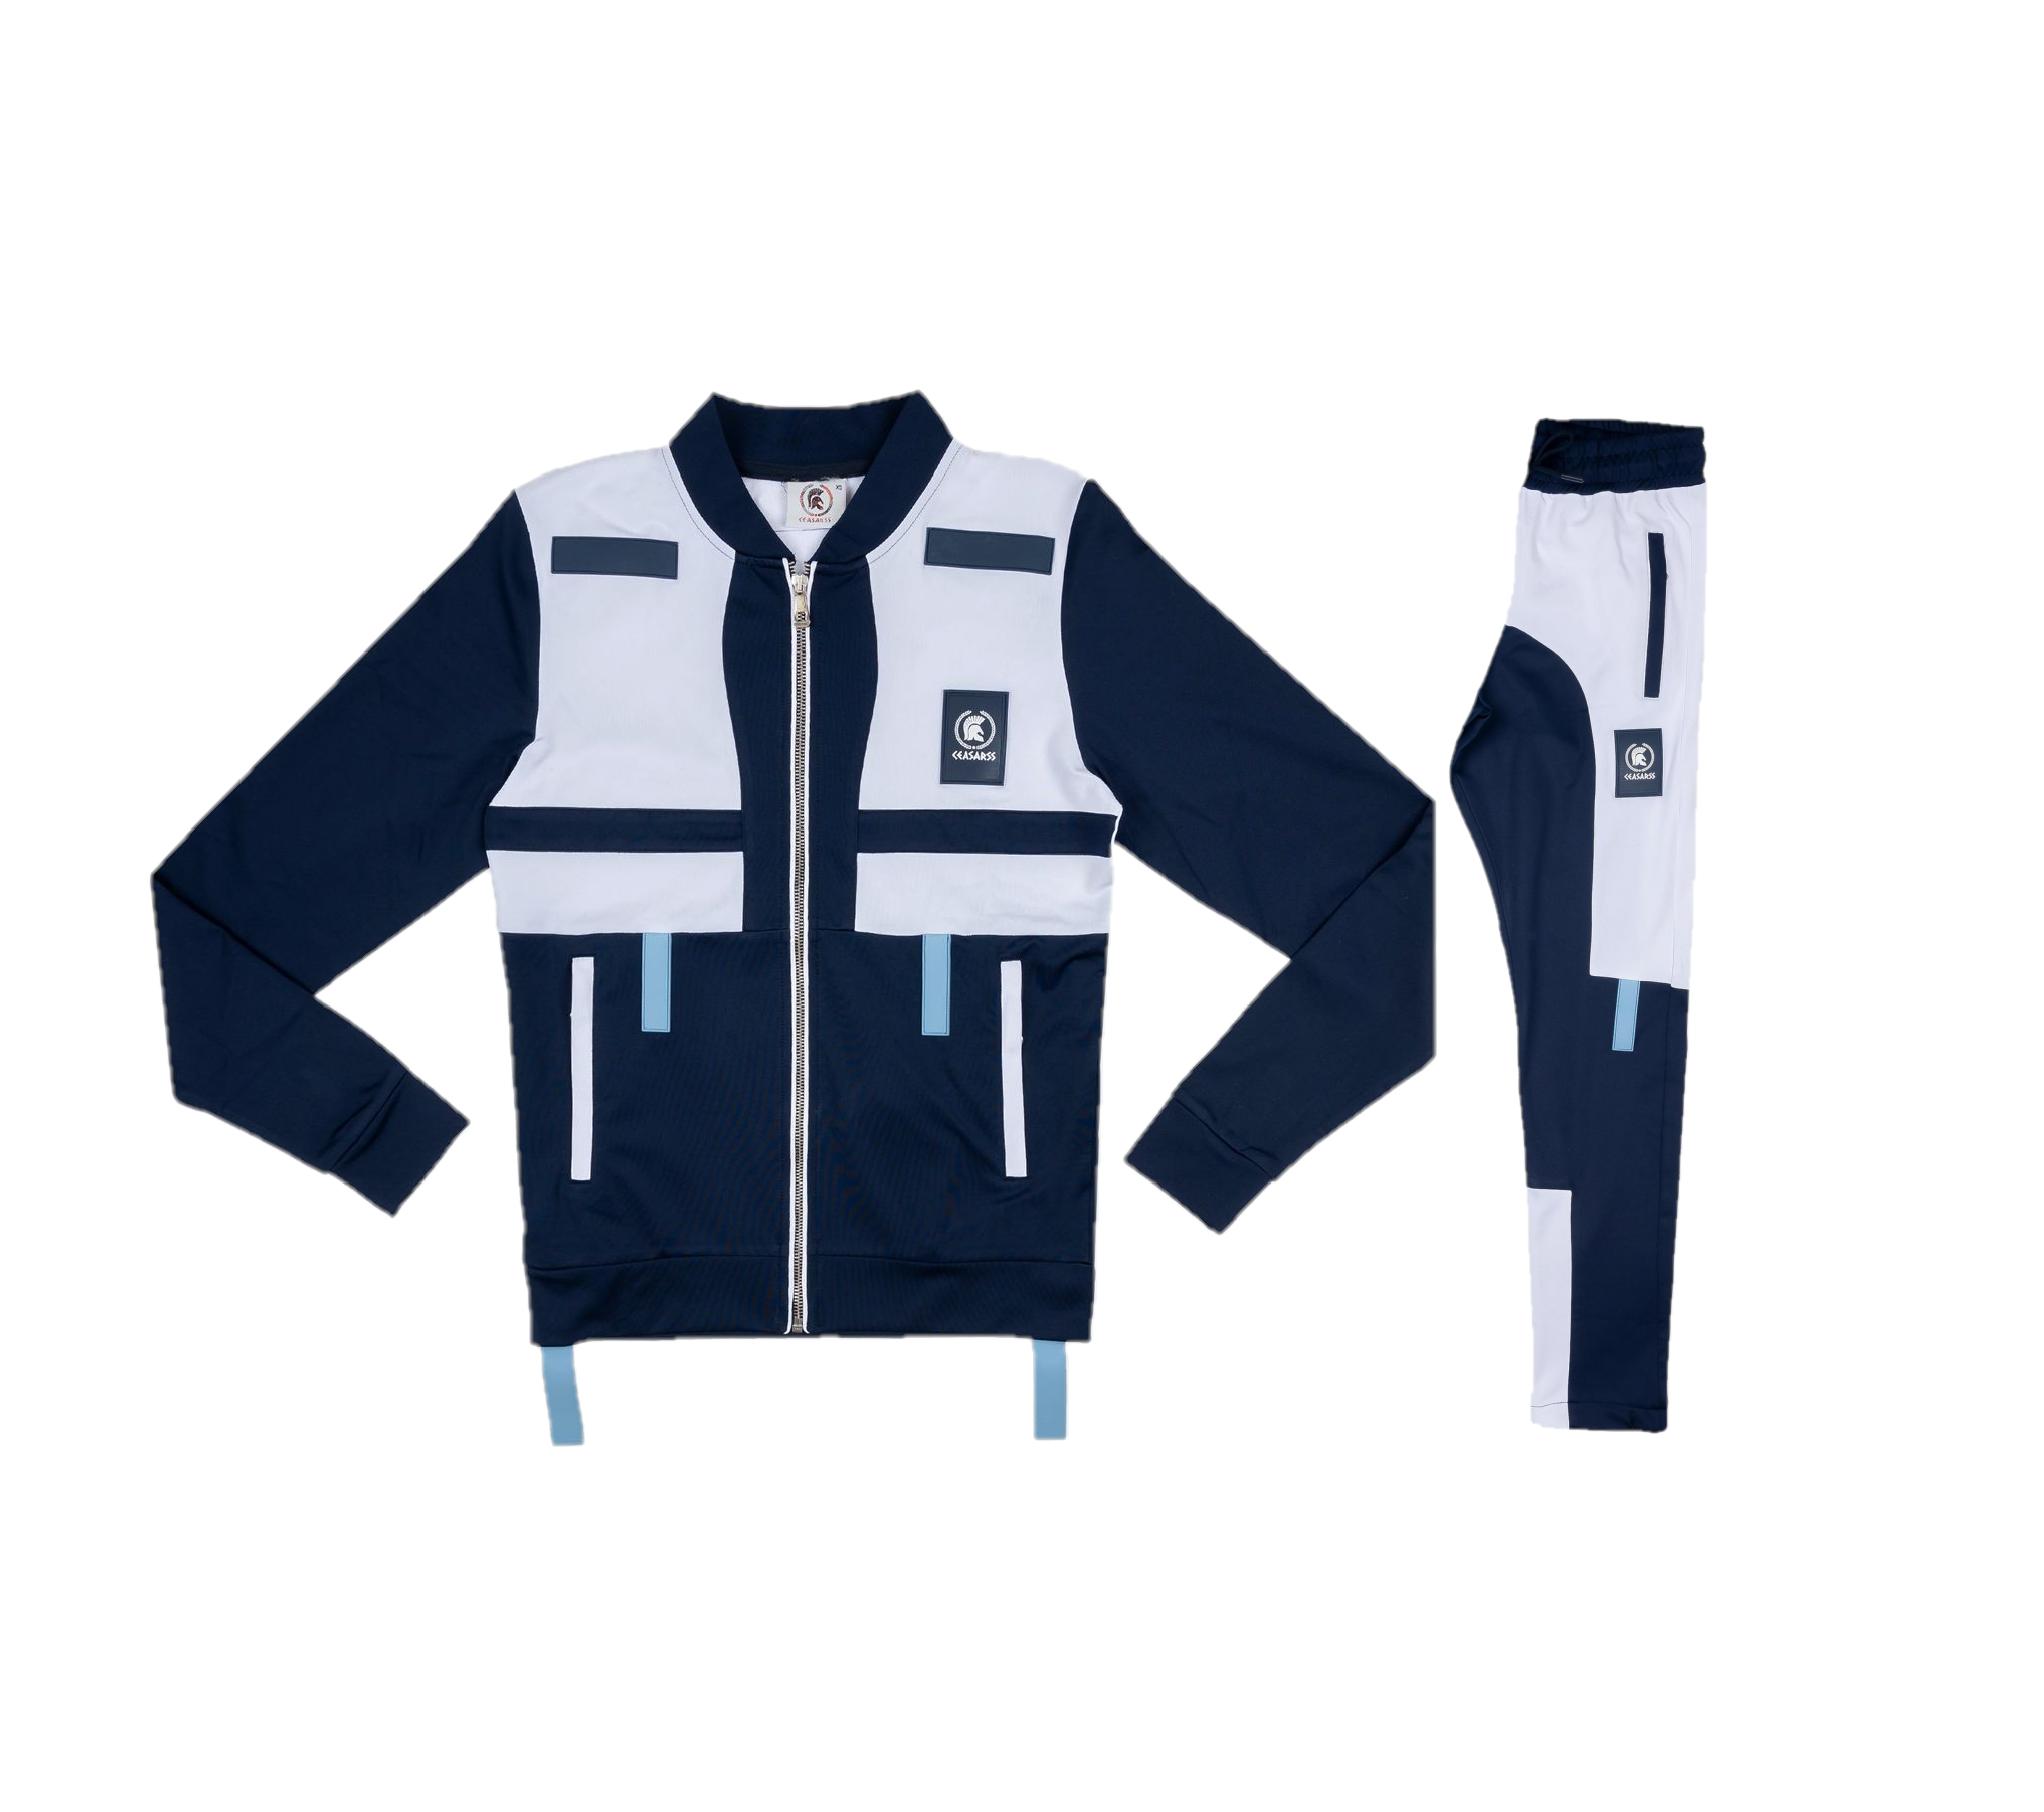 Ceasarss Rescue Trainingspak Blue - Maat XS - Kleur: Blauw | Soccerfanshop